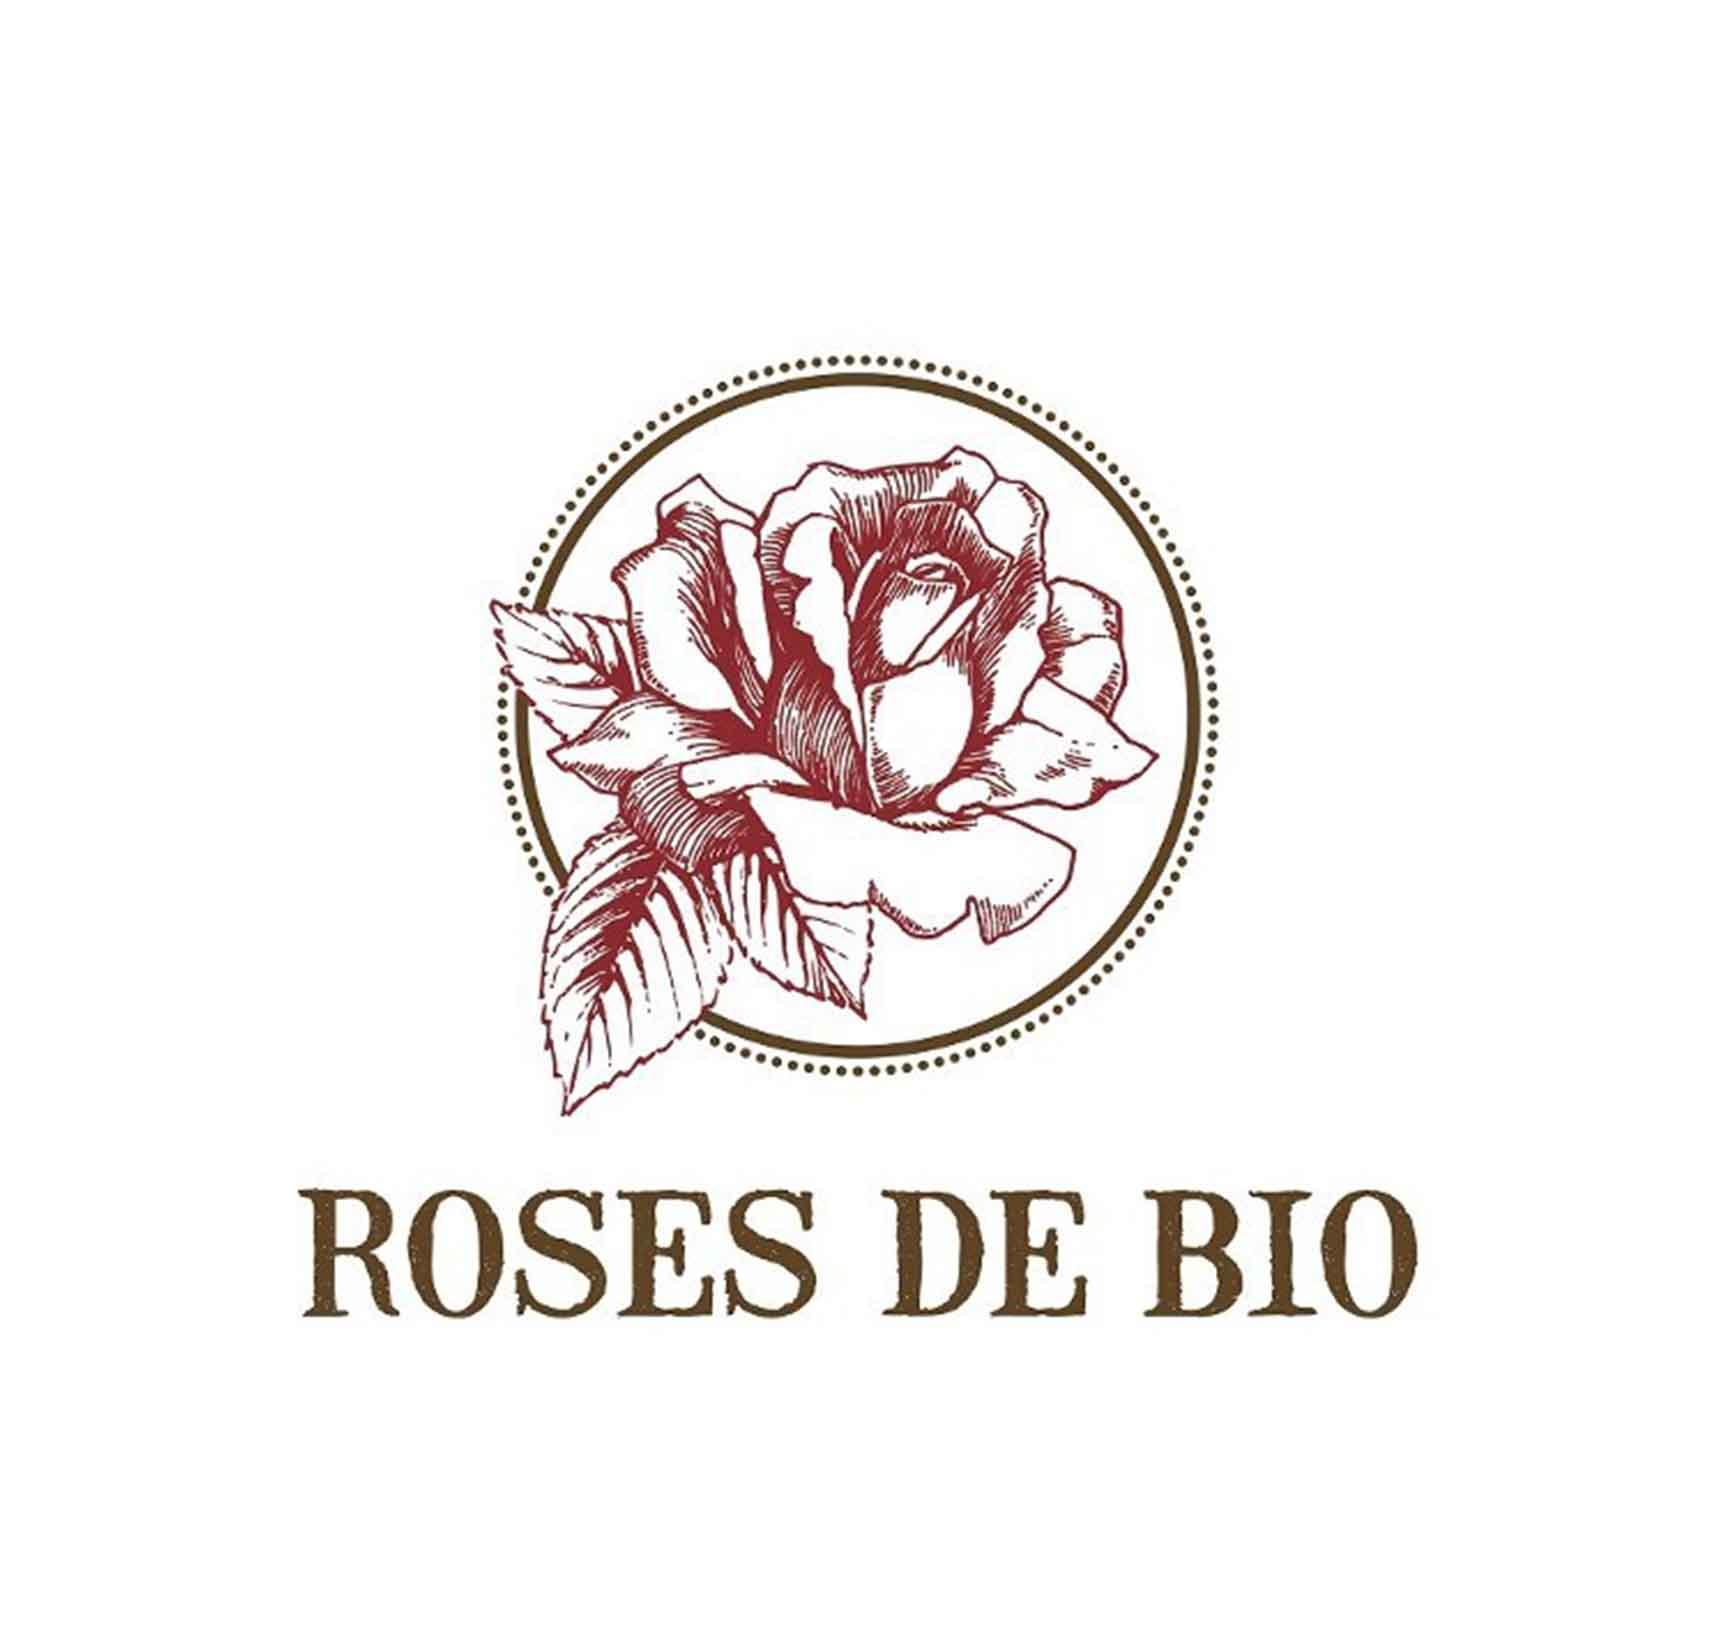 rosesdebio